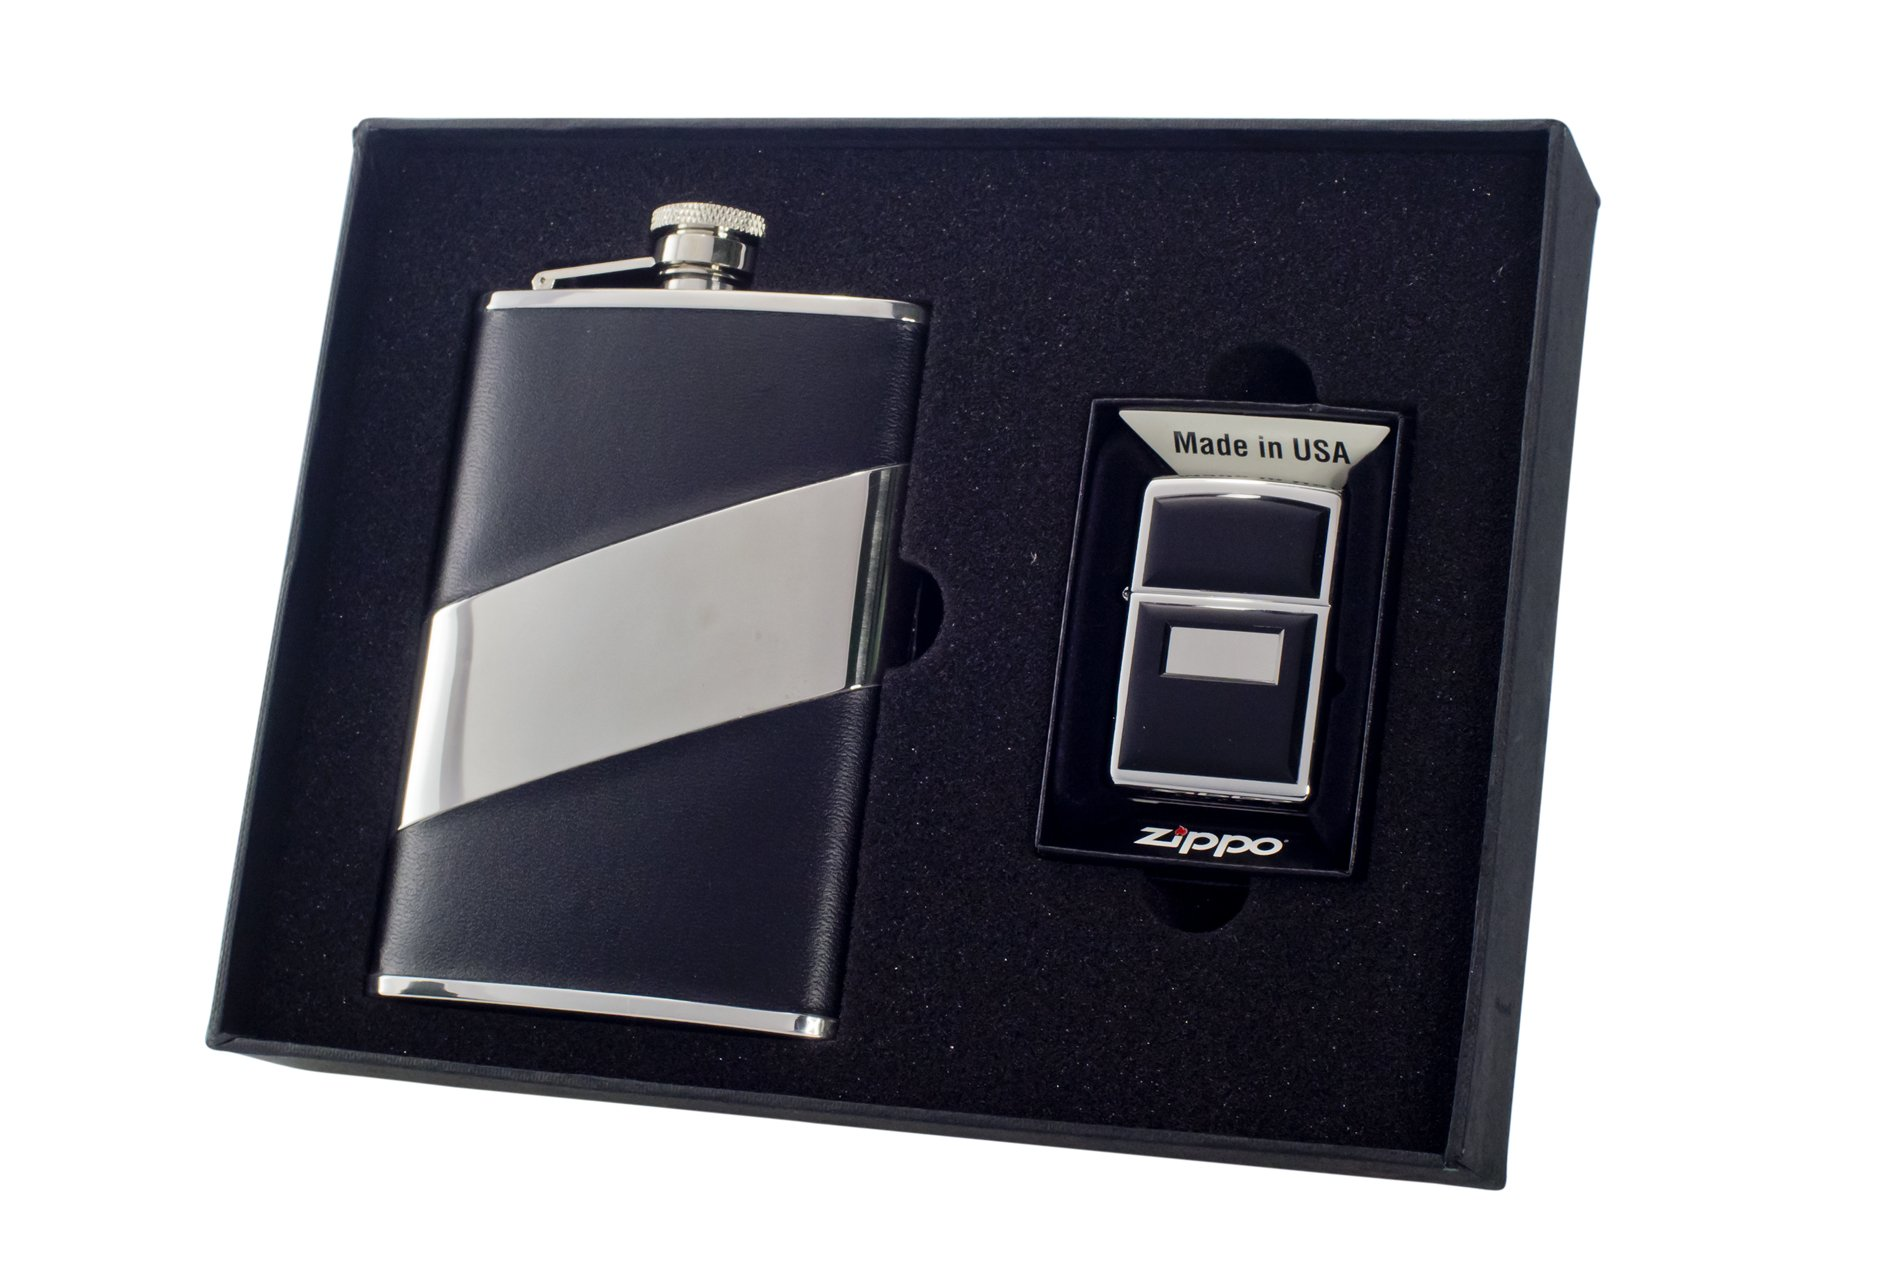 Visol''Descent'' Flask and Zippo Lighter Gift Set with Black Emblem, 8-Ounce